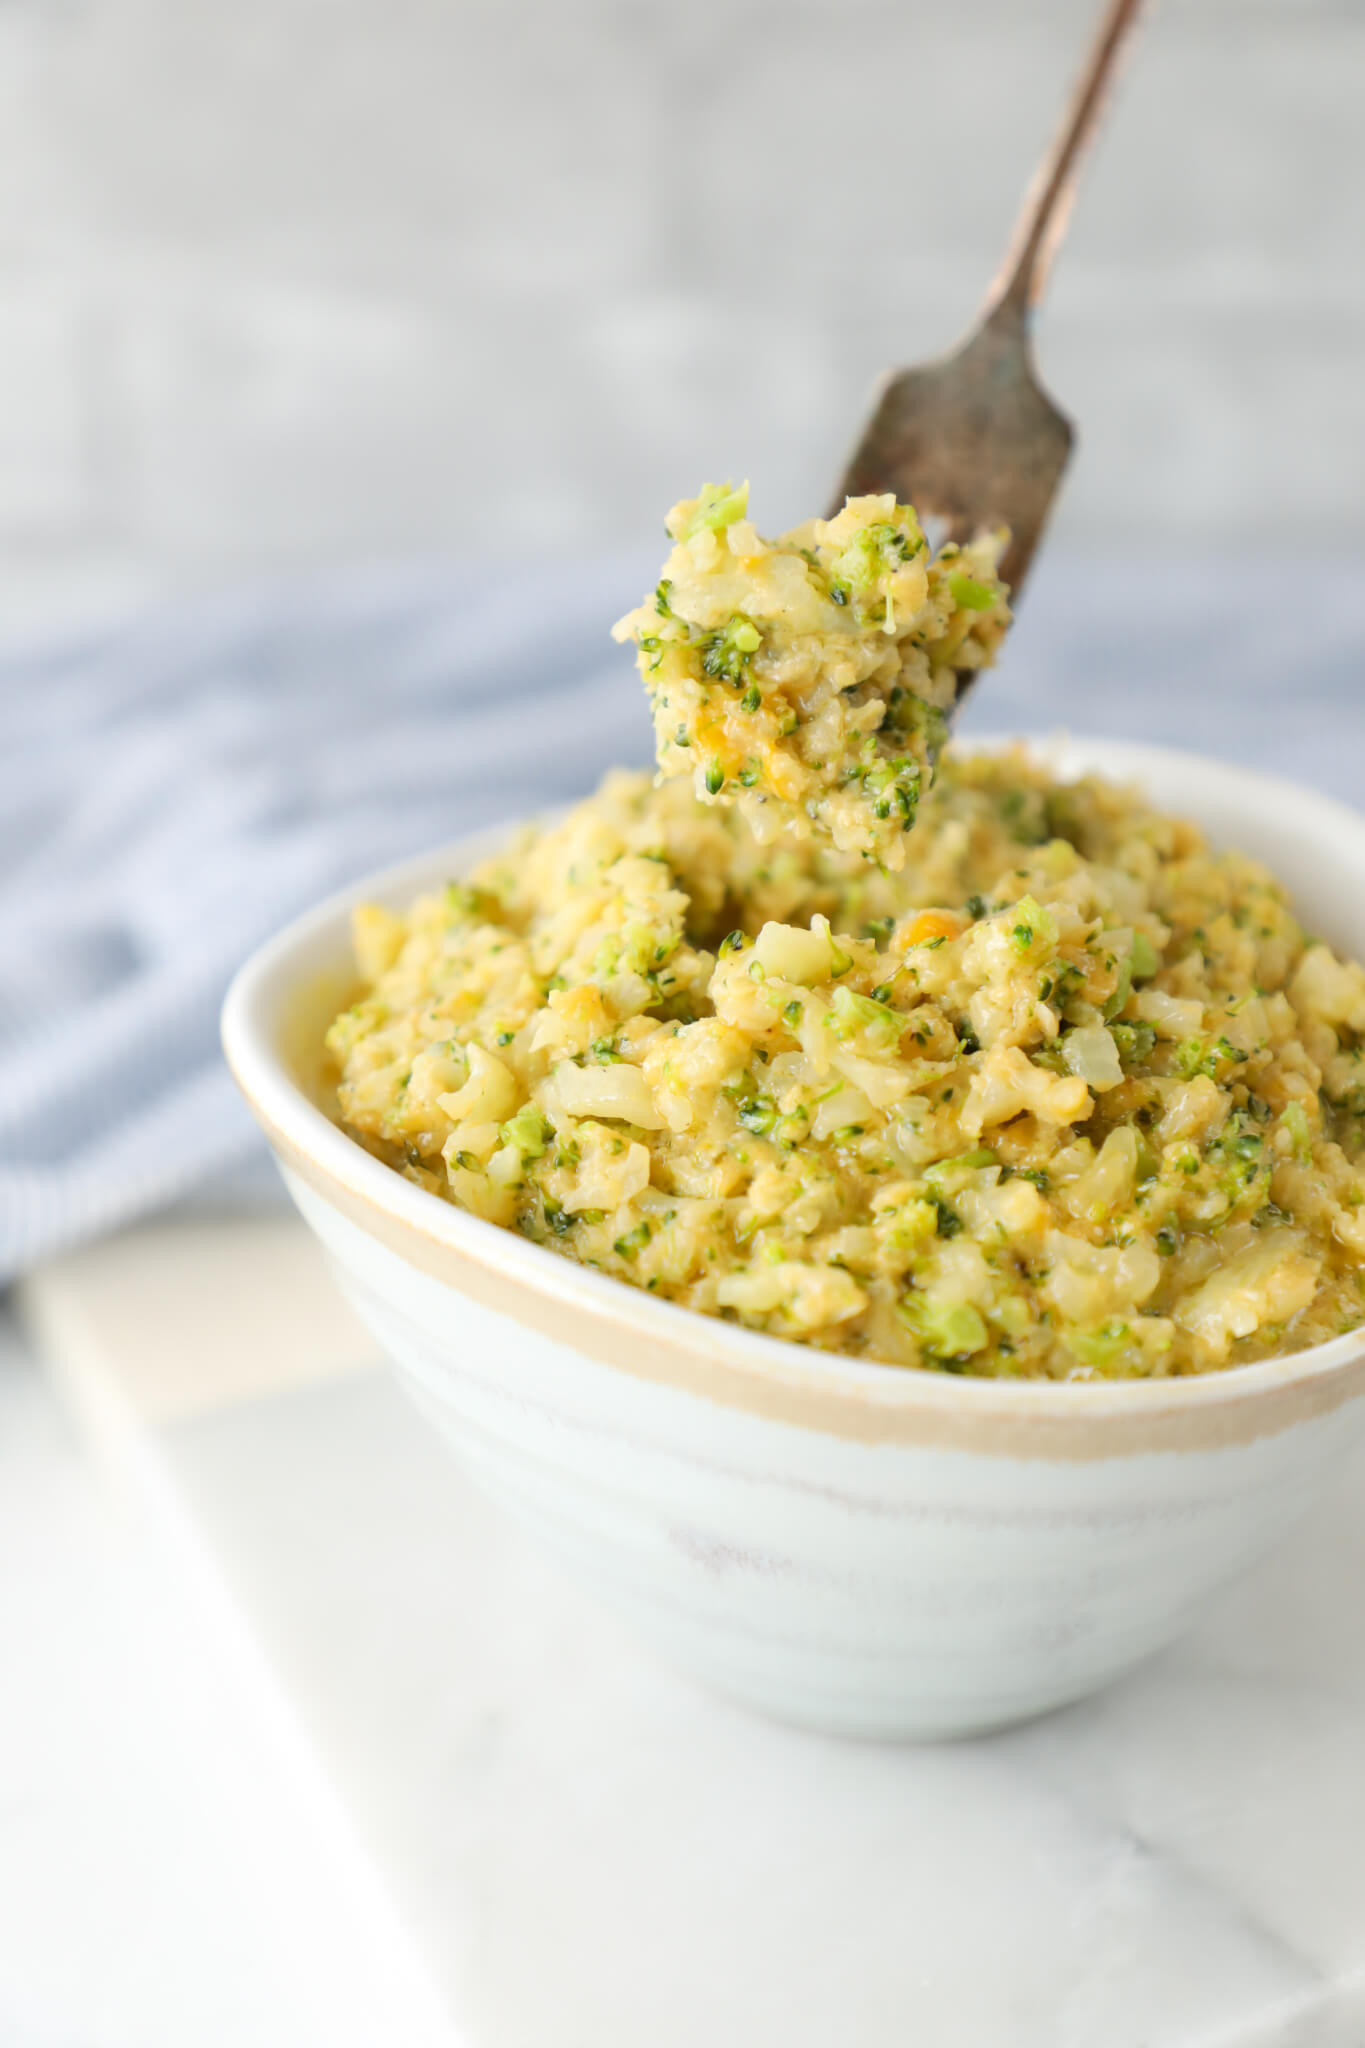 Broccoli Cauliflower Keto  Keto Cheesy Broccoli & Cauliflower Rice